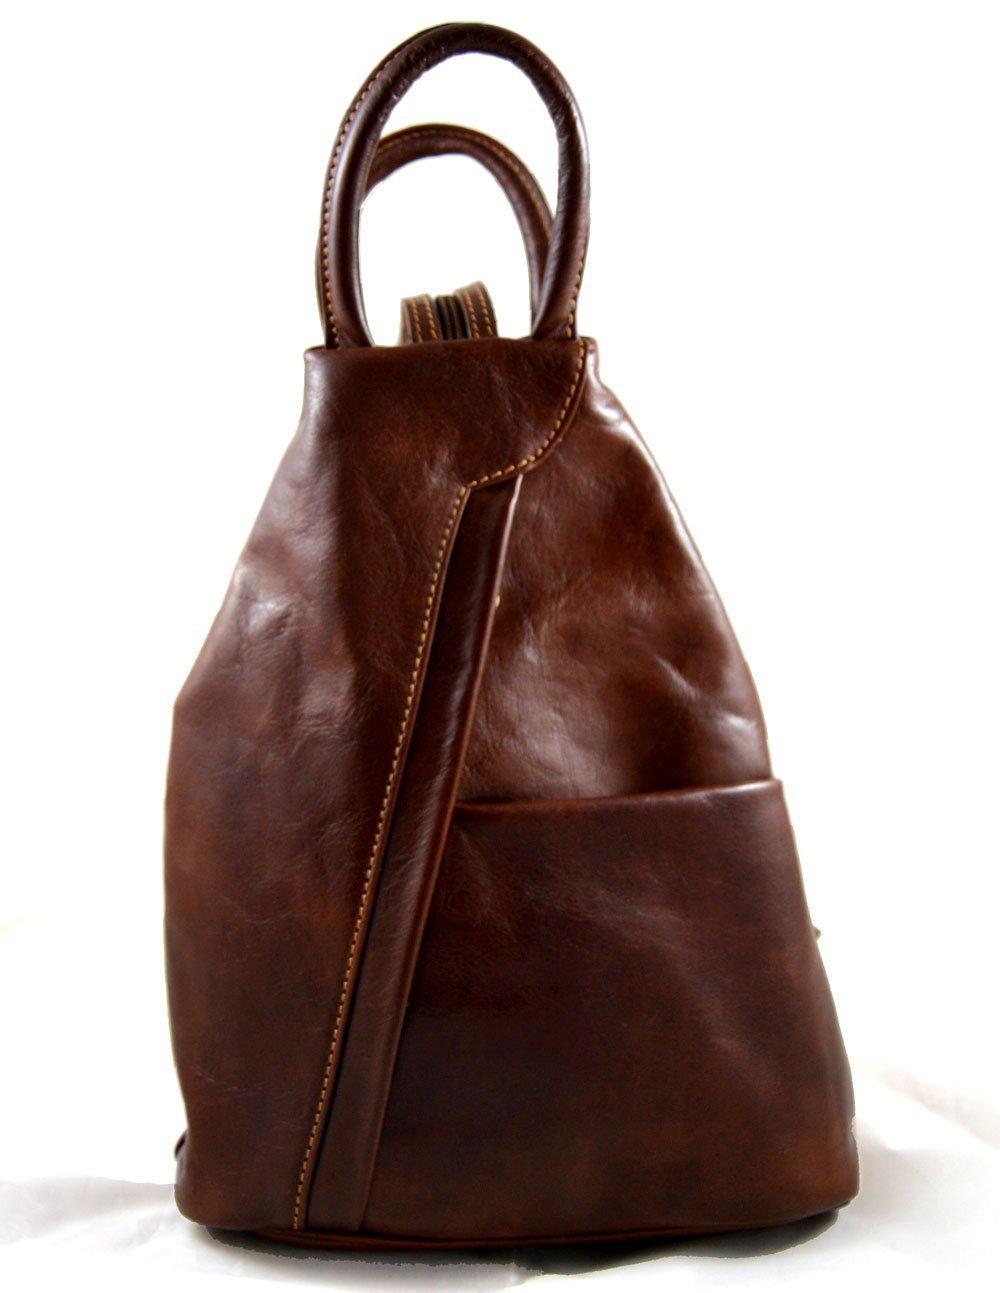 Sac à dos bandoulière en cuir sac homme sac femme sac homme à bandoulière  sac hobo 3151f18eafa5